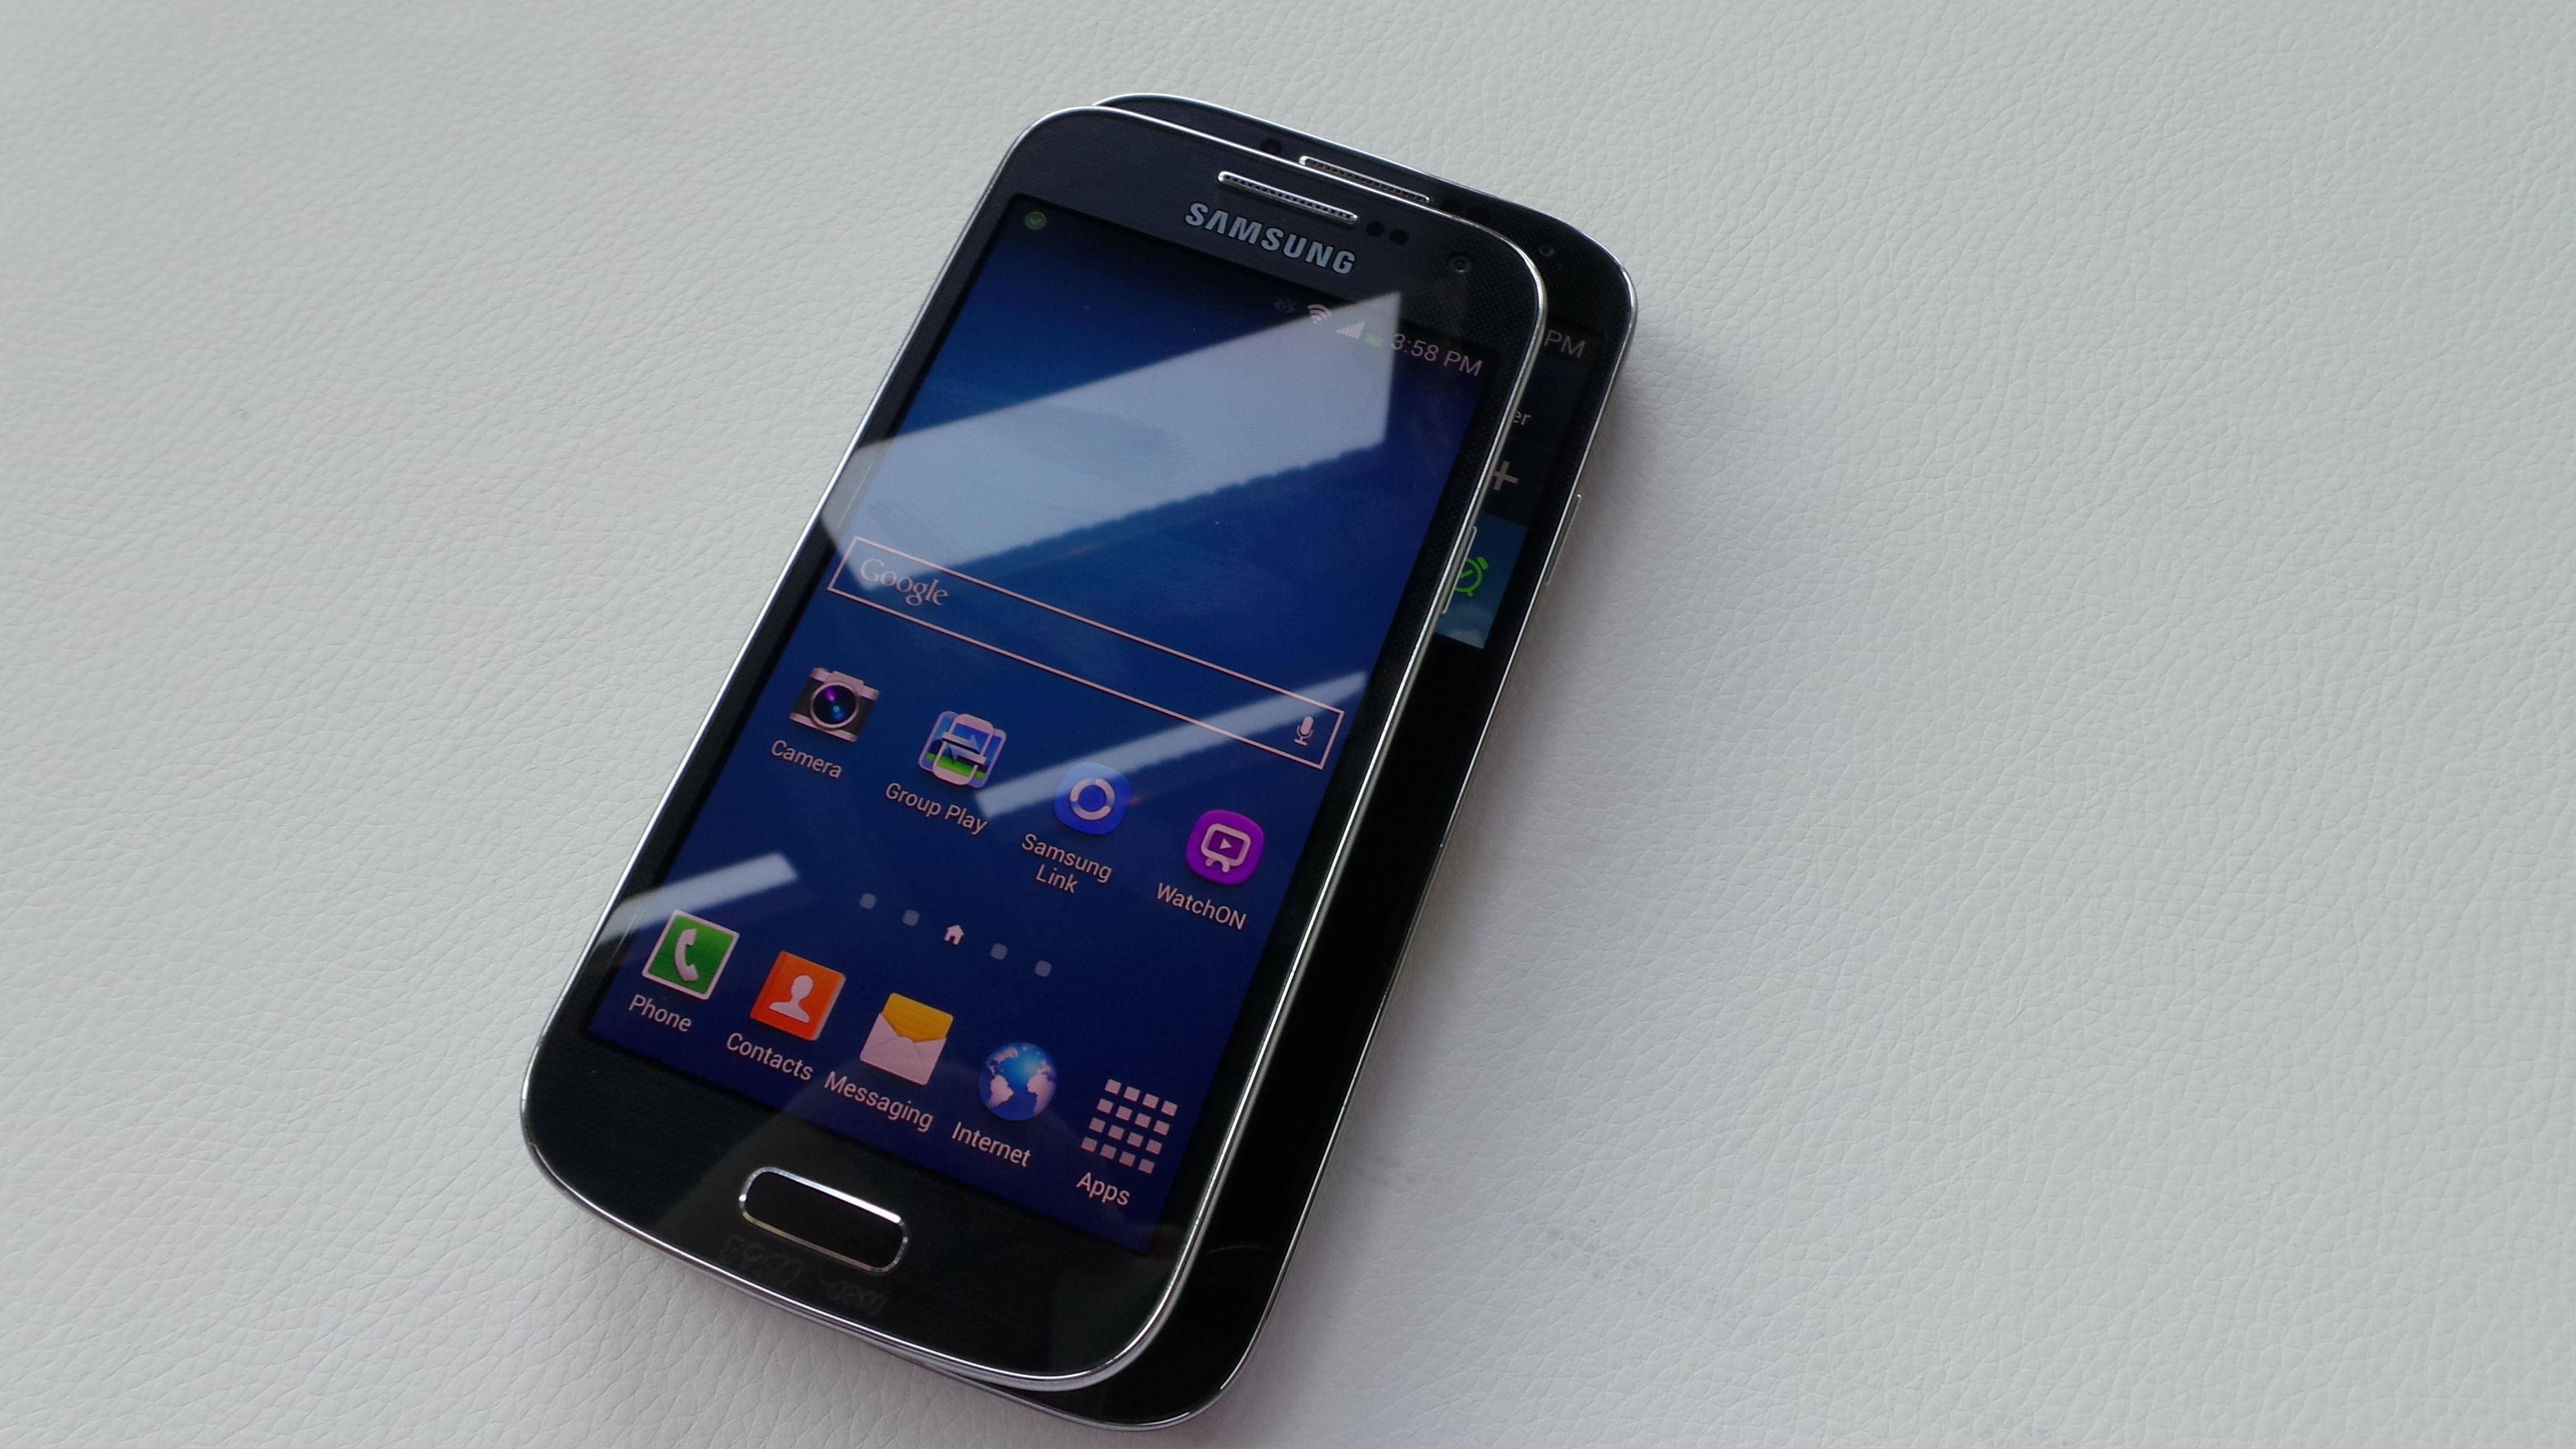 Samsung Galaxy S4 Vs Samsung Galaxy S4 Mini Hands